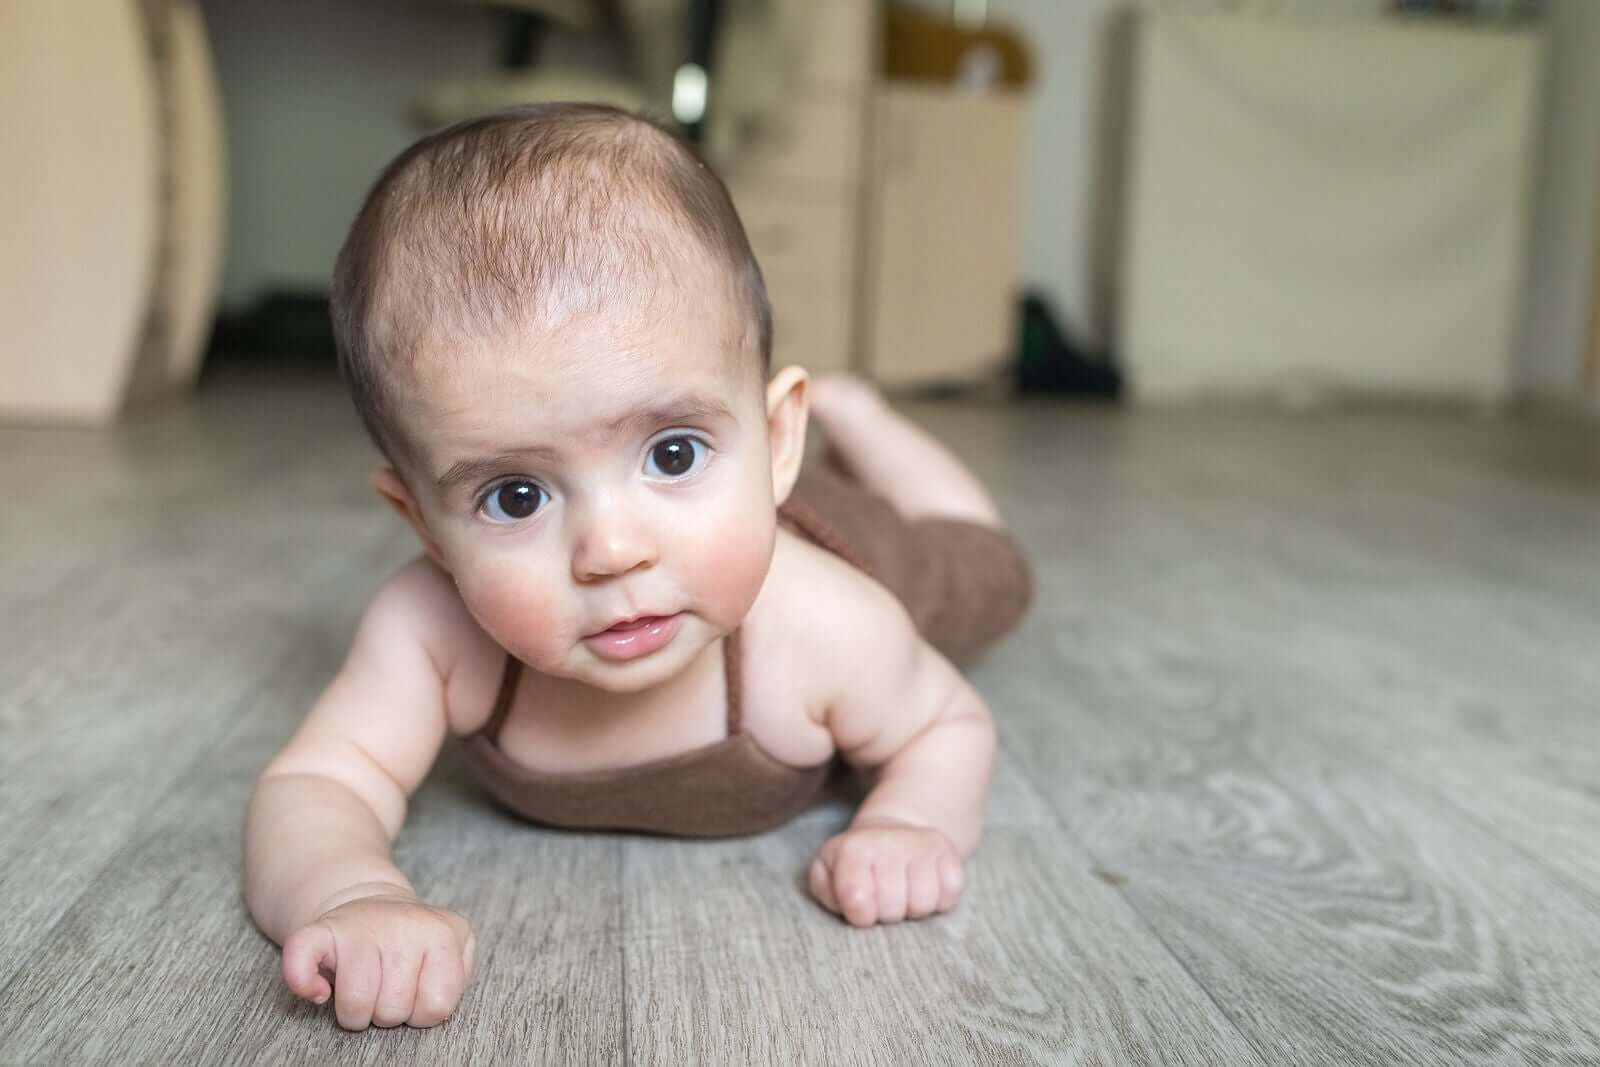 Baby starting to crawl.